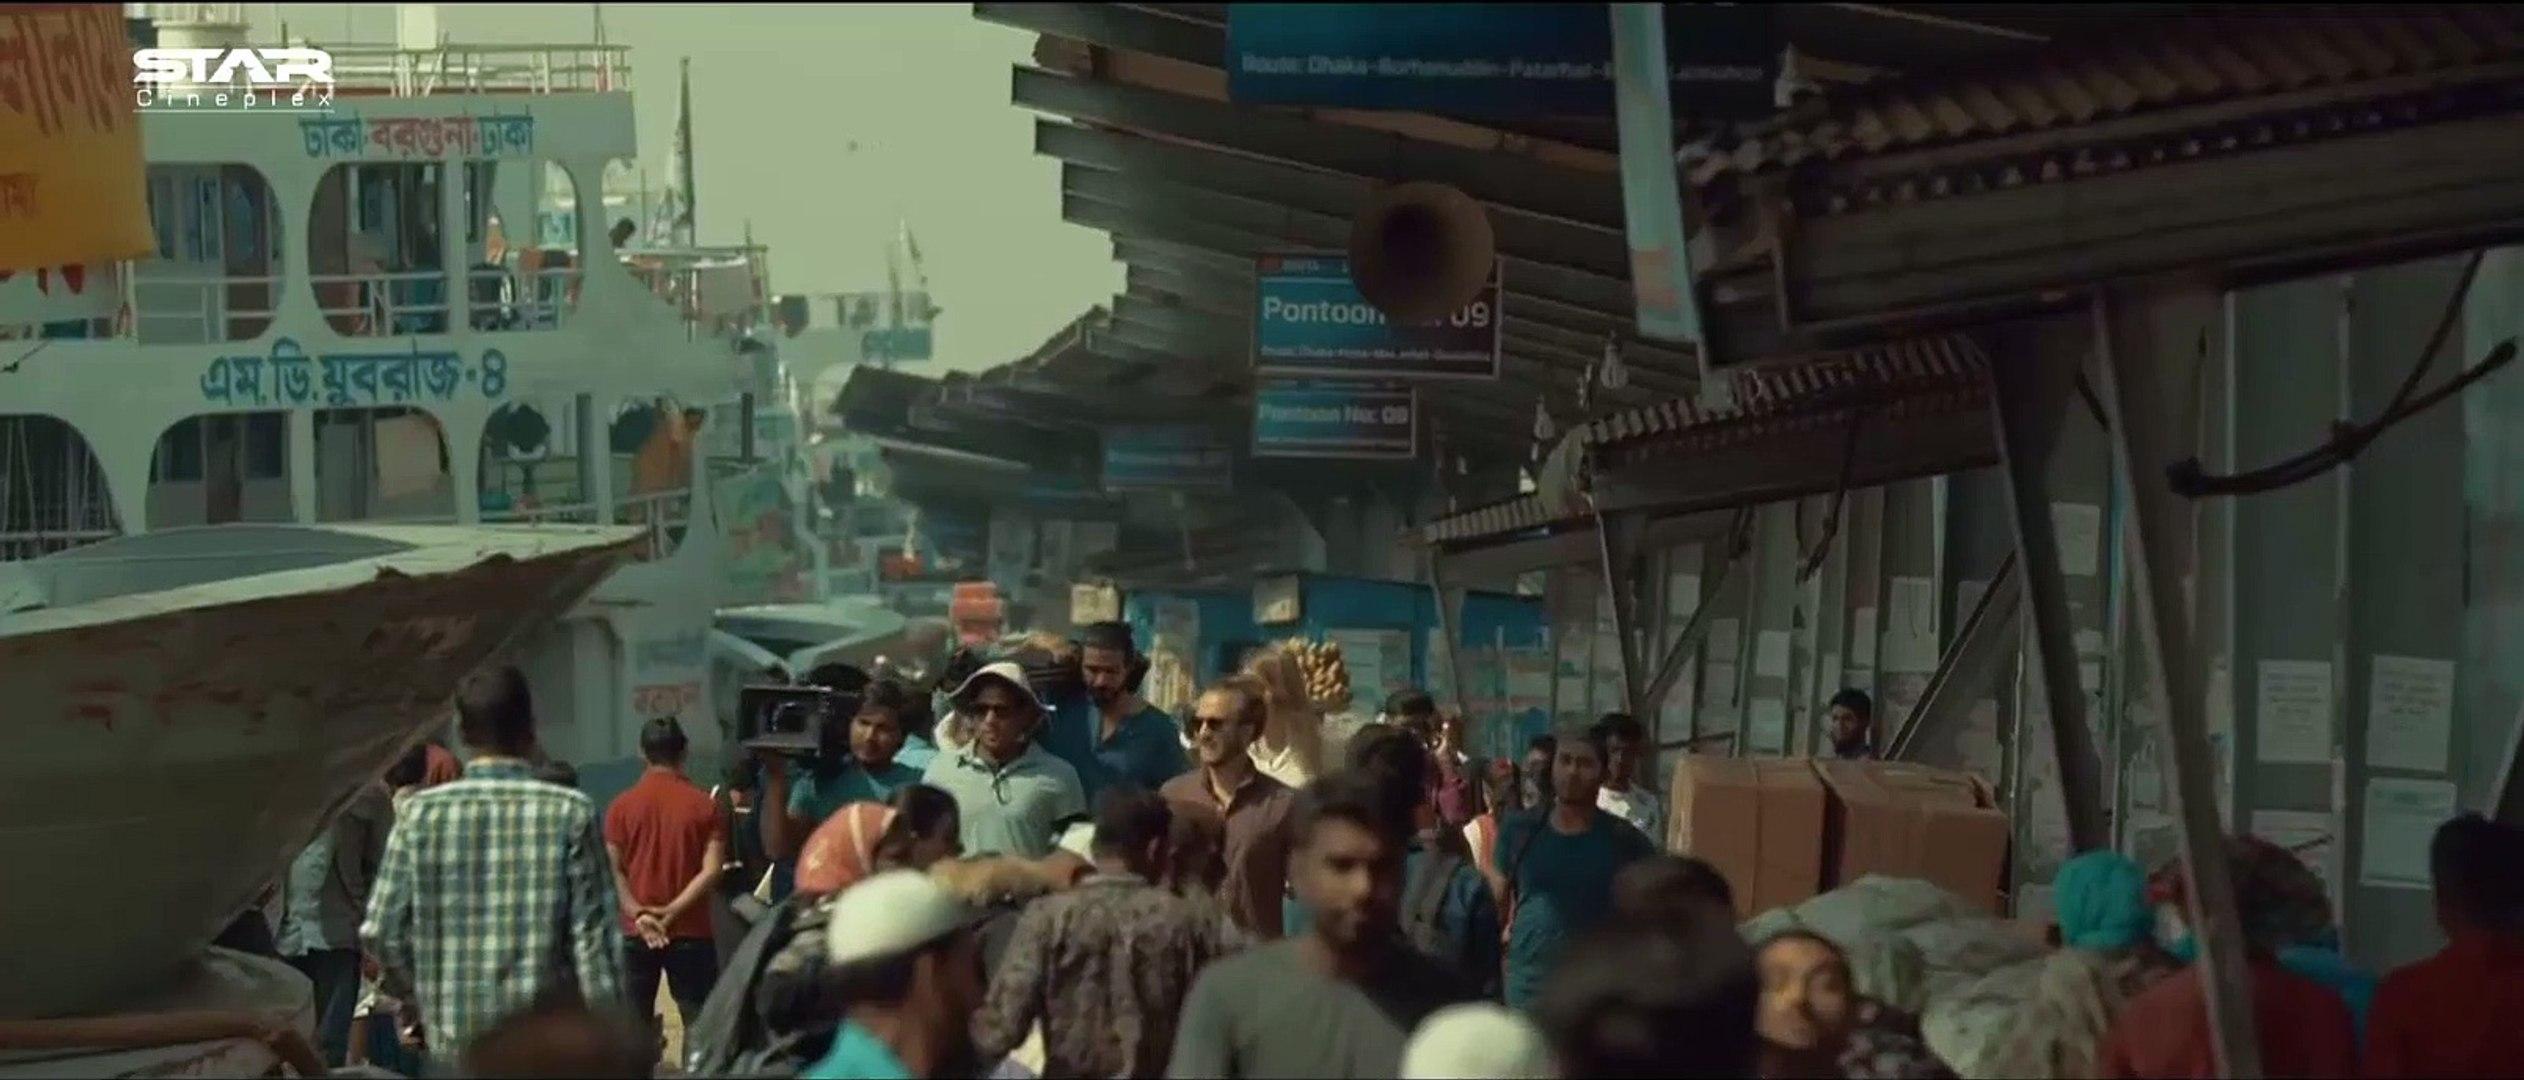 Jontrona by Nodorai Movie Song - Bangla Movie Song 2020